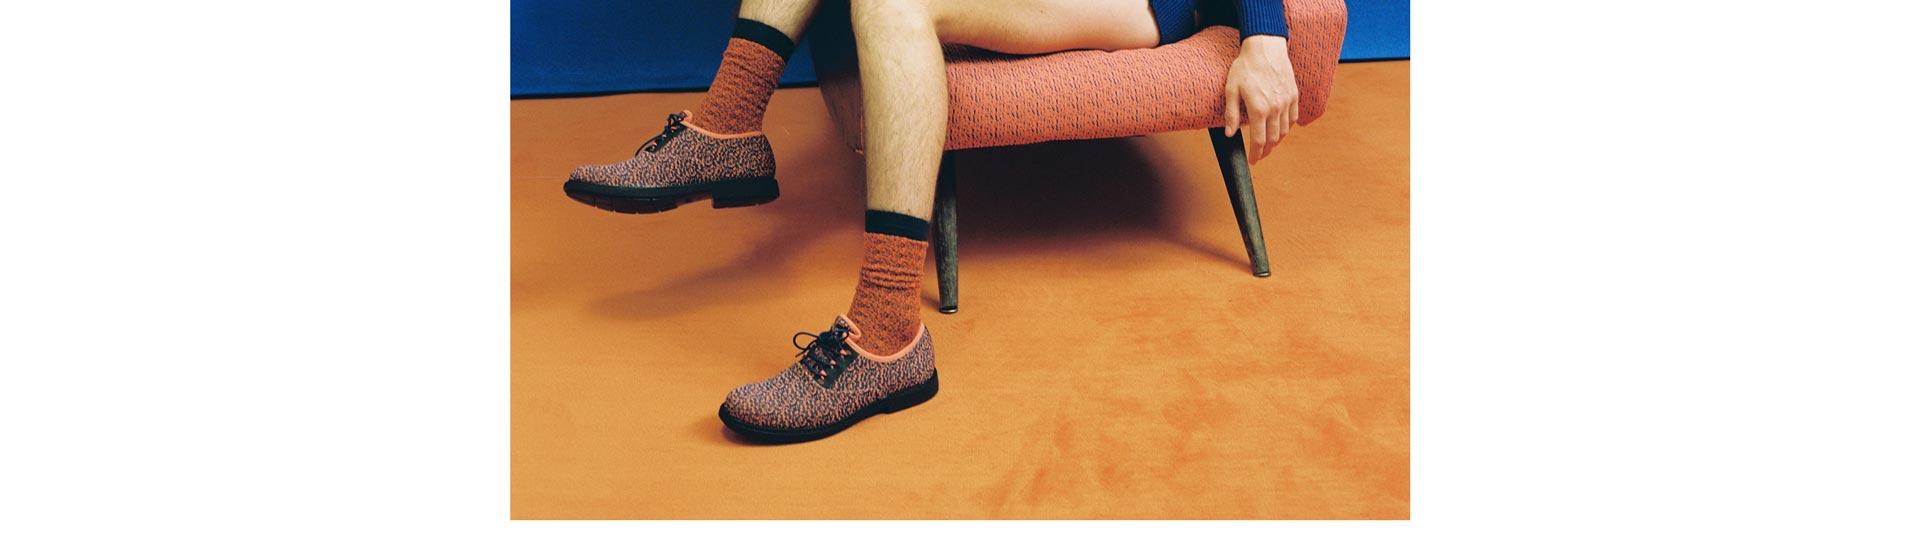 Camper Shoes - Official Online Store a913a8638dc